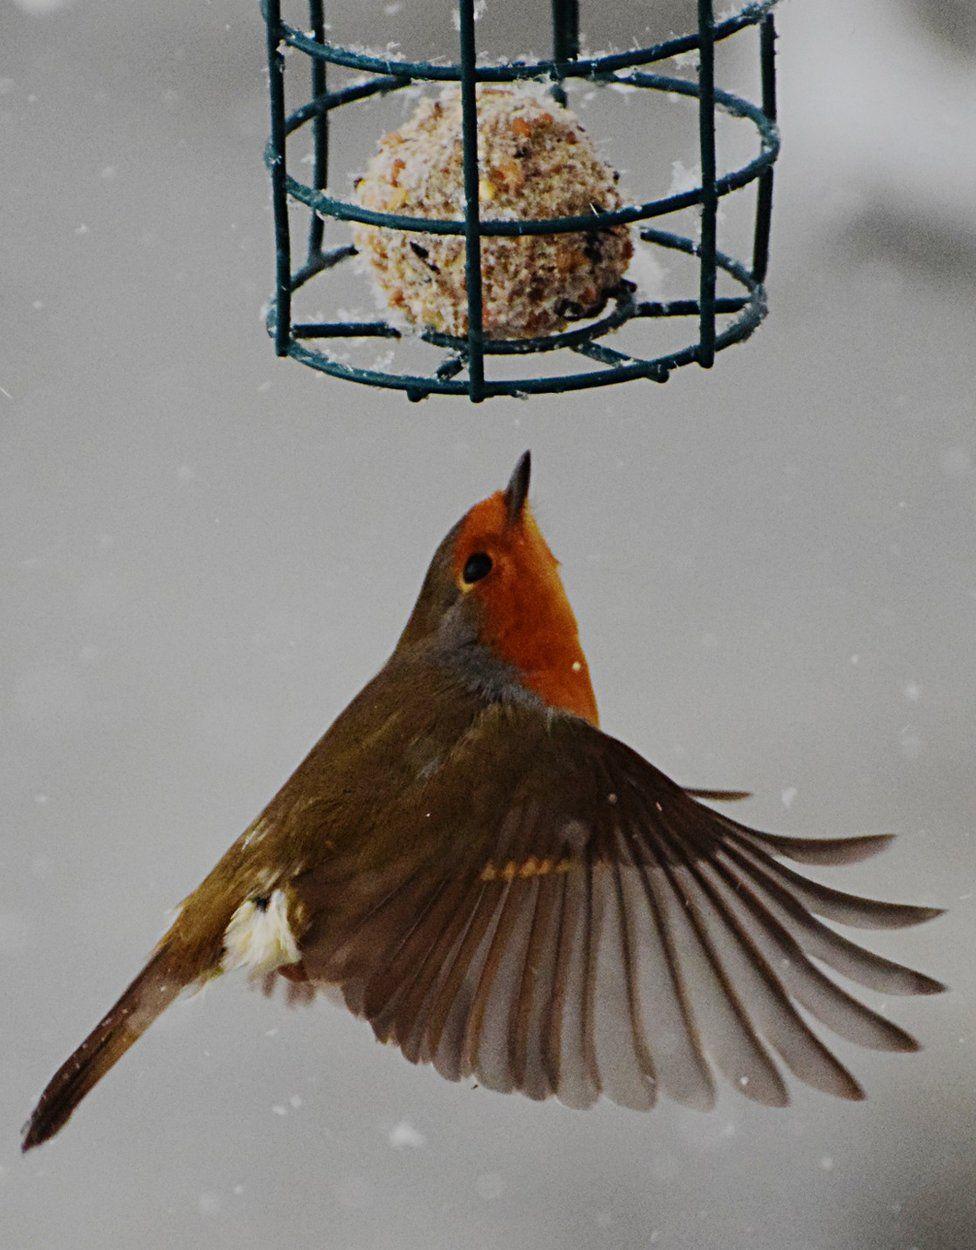 Robin at Bavelaw bird hide